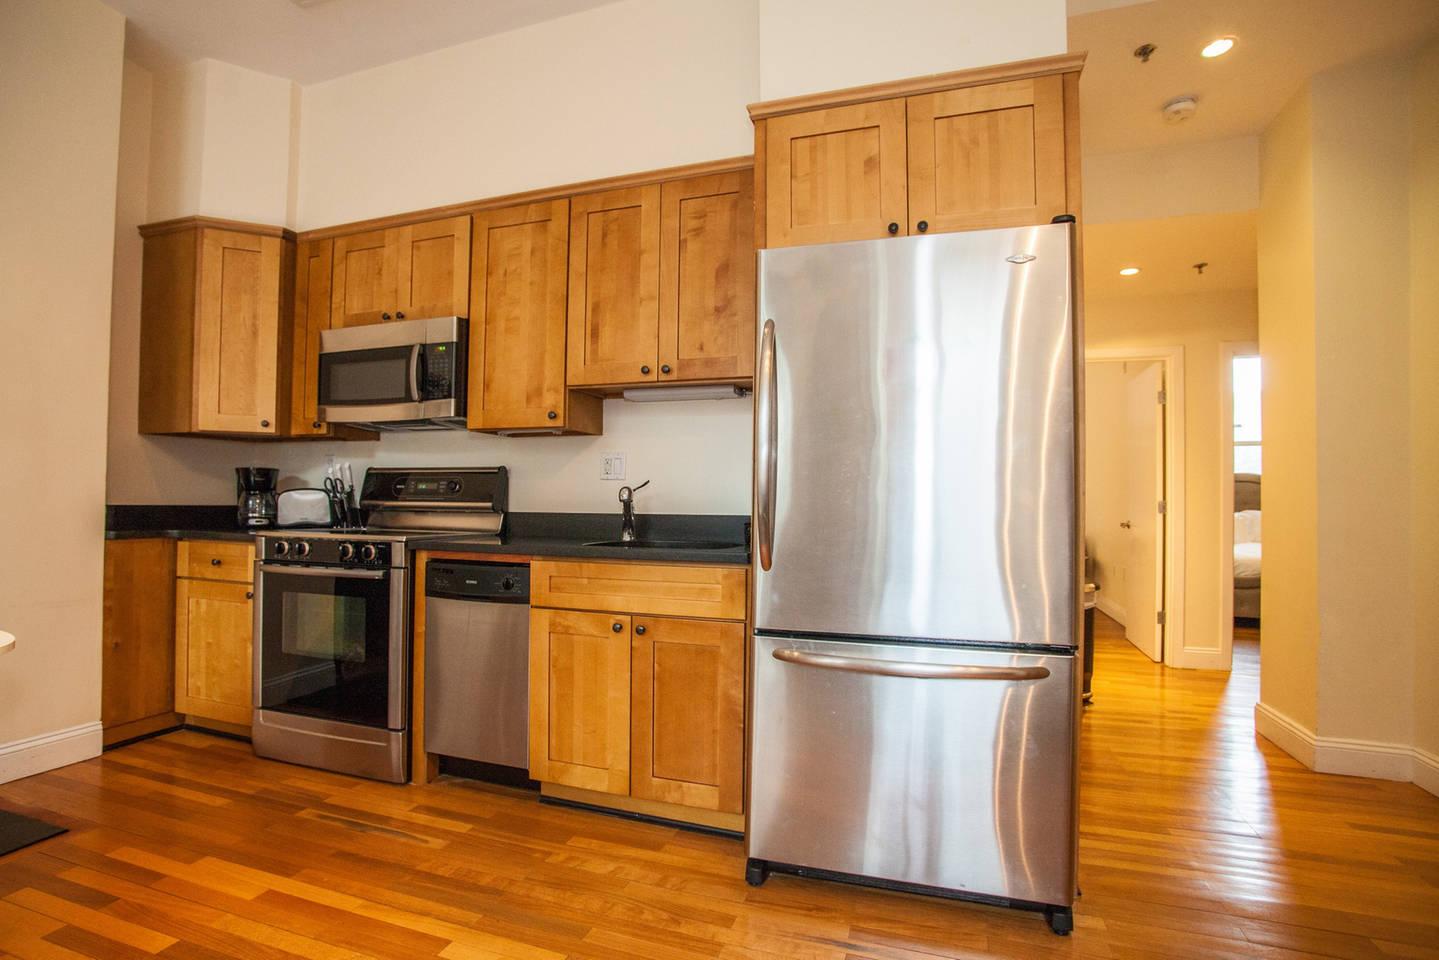 Luxe Condo Back Bay Boston-3 Bedrooms & 2 Baths photo 16366302